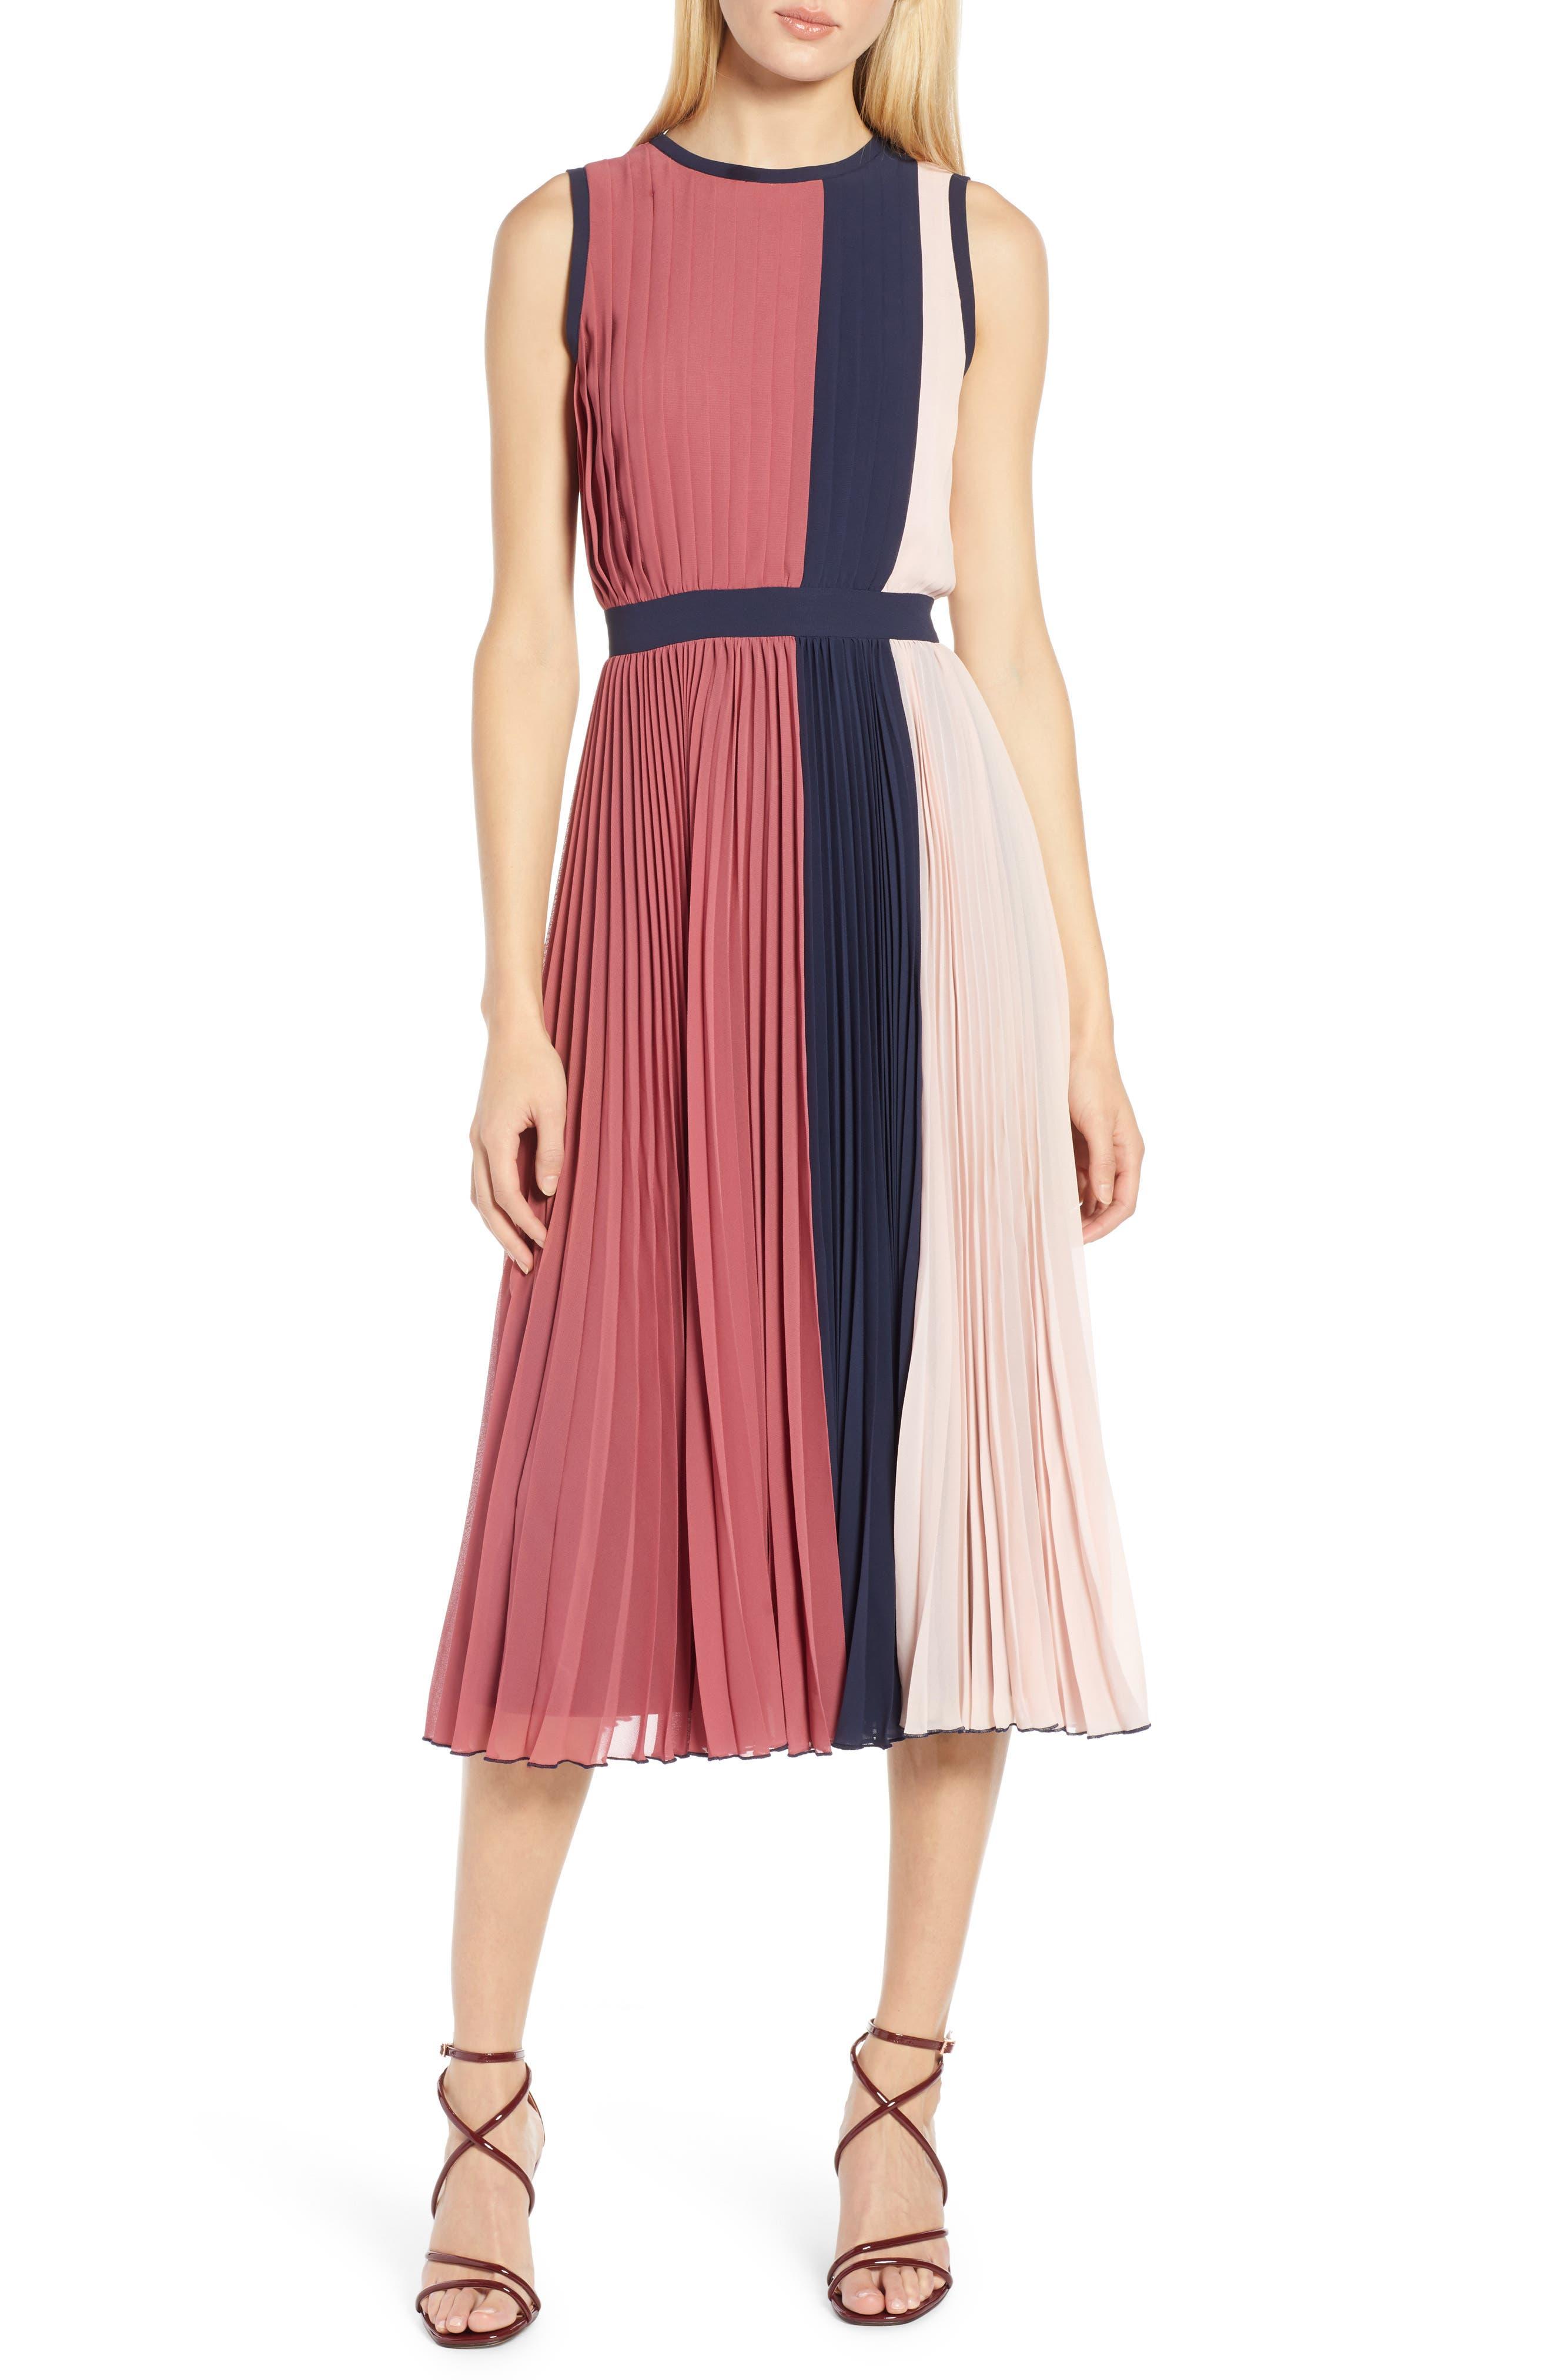 x Atlantic-Pacific Colorblock Pleated Midi Dress,                             Main thumbnail 1, color,                             PINK- NAVY COLORBLOCK